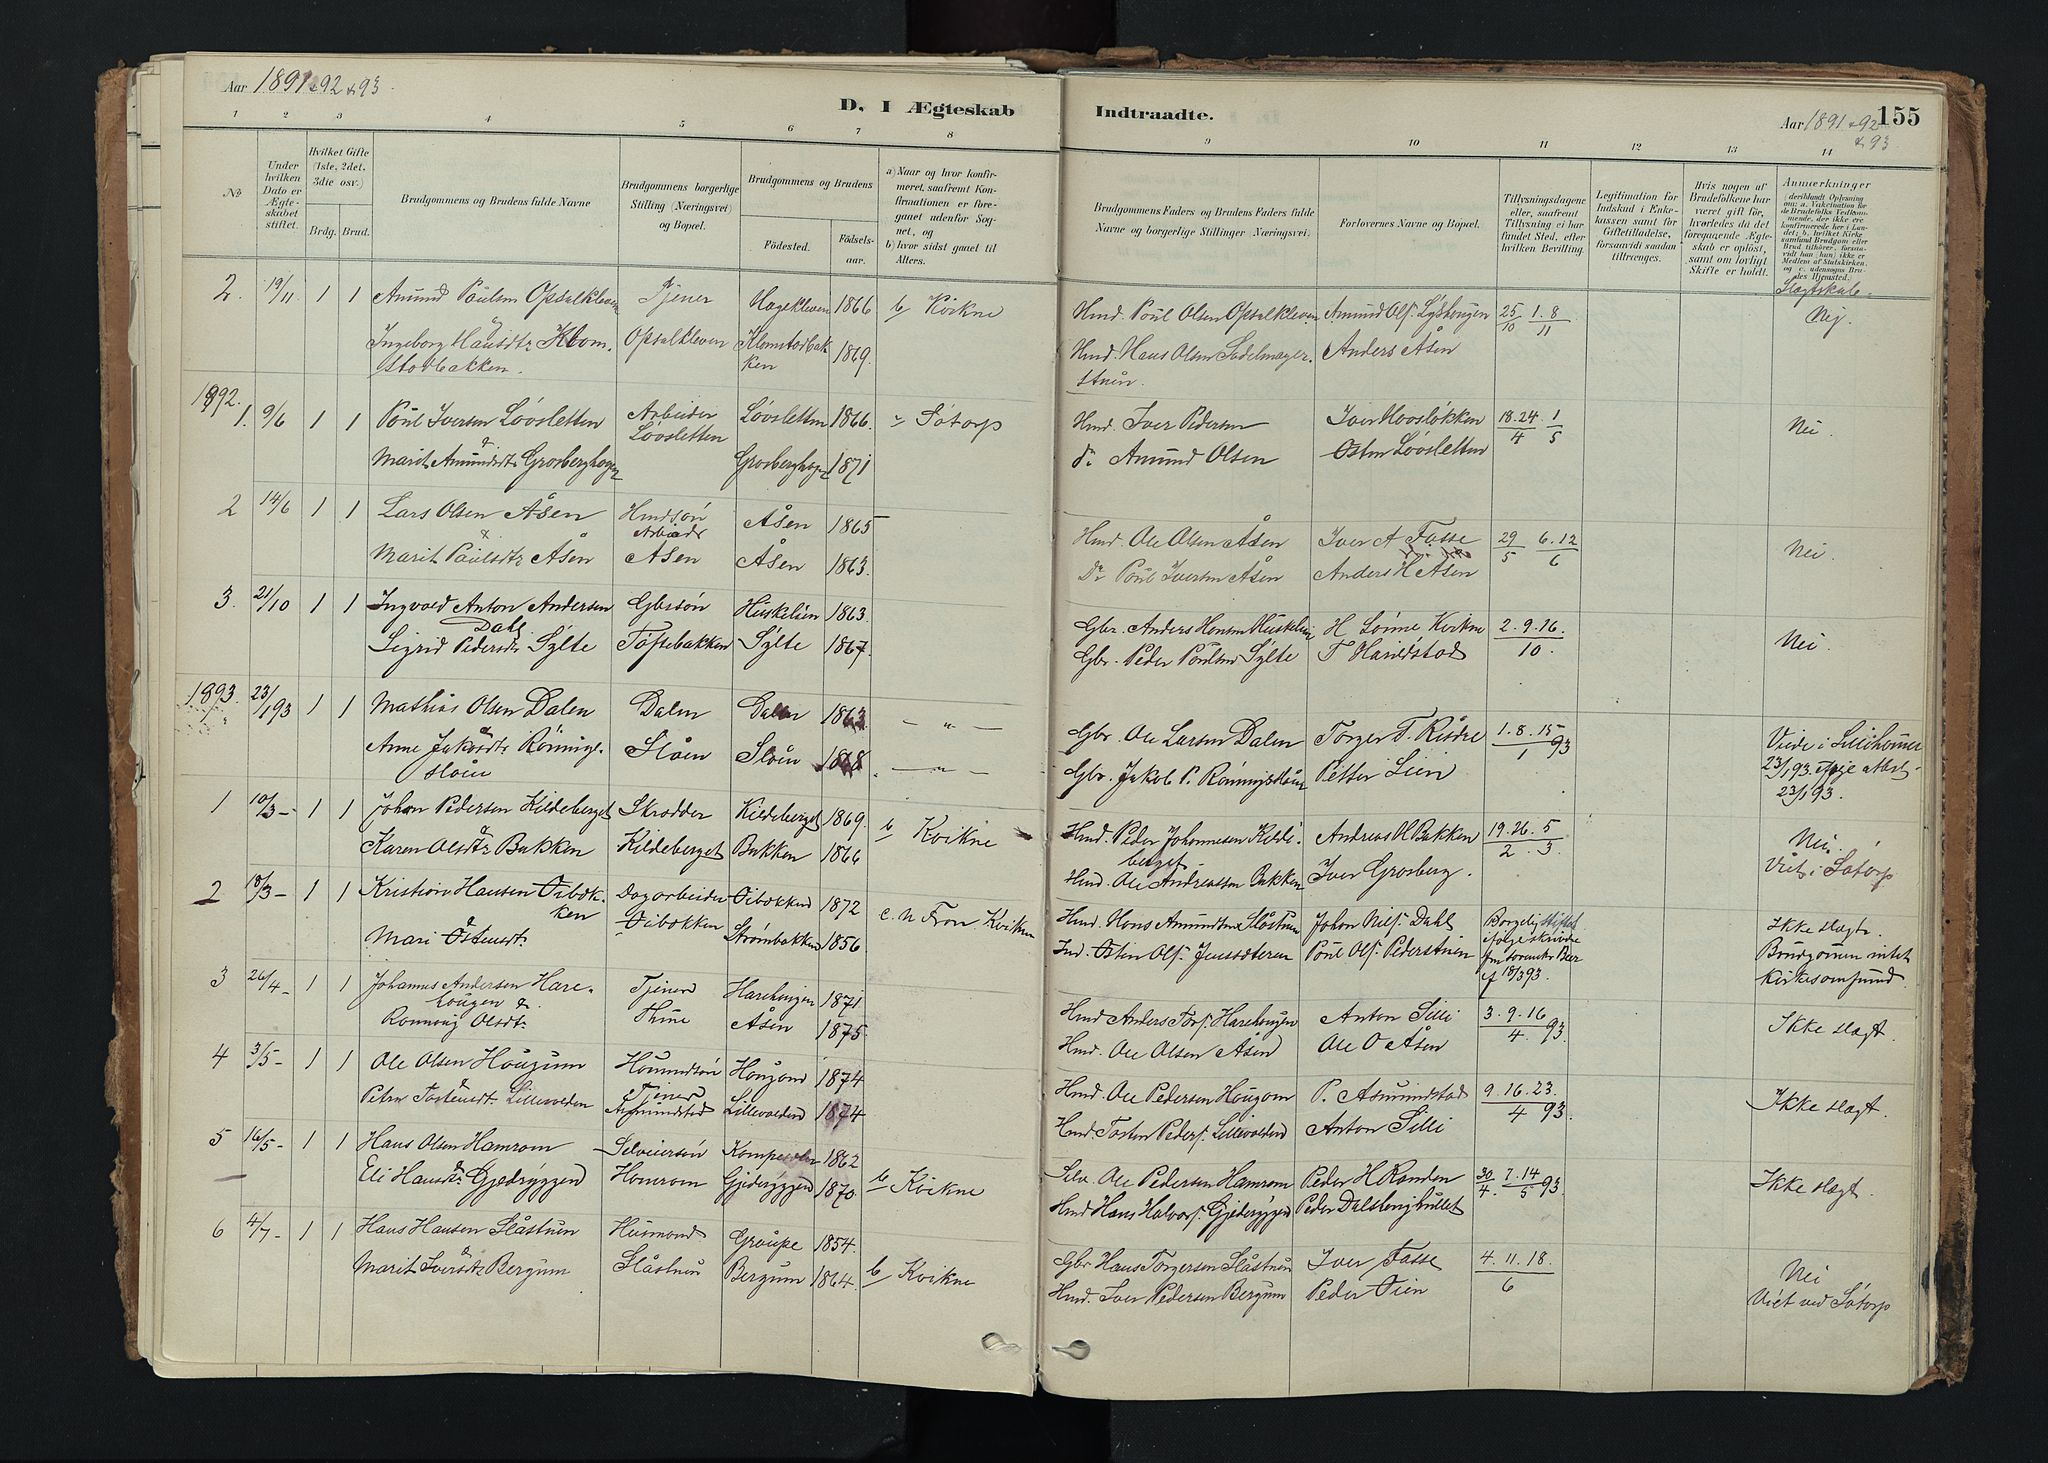 SAH, Nord-Fron prestekontor, Ministerialbok nr. 5, 1884-1914, s. 155